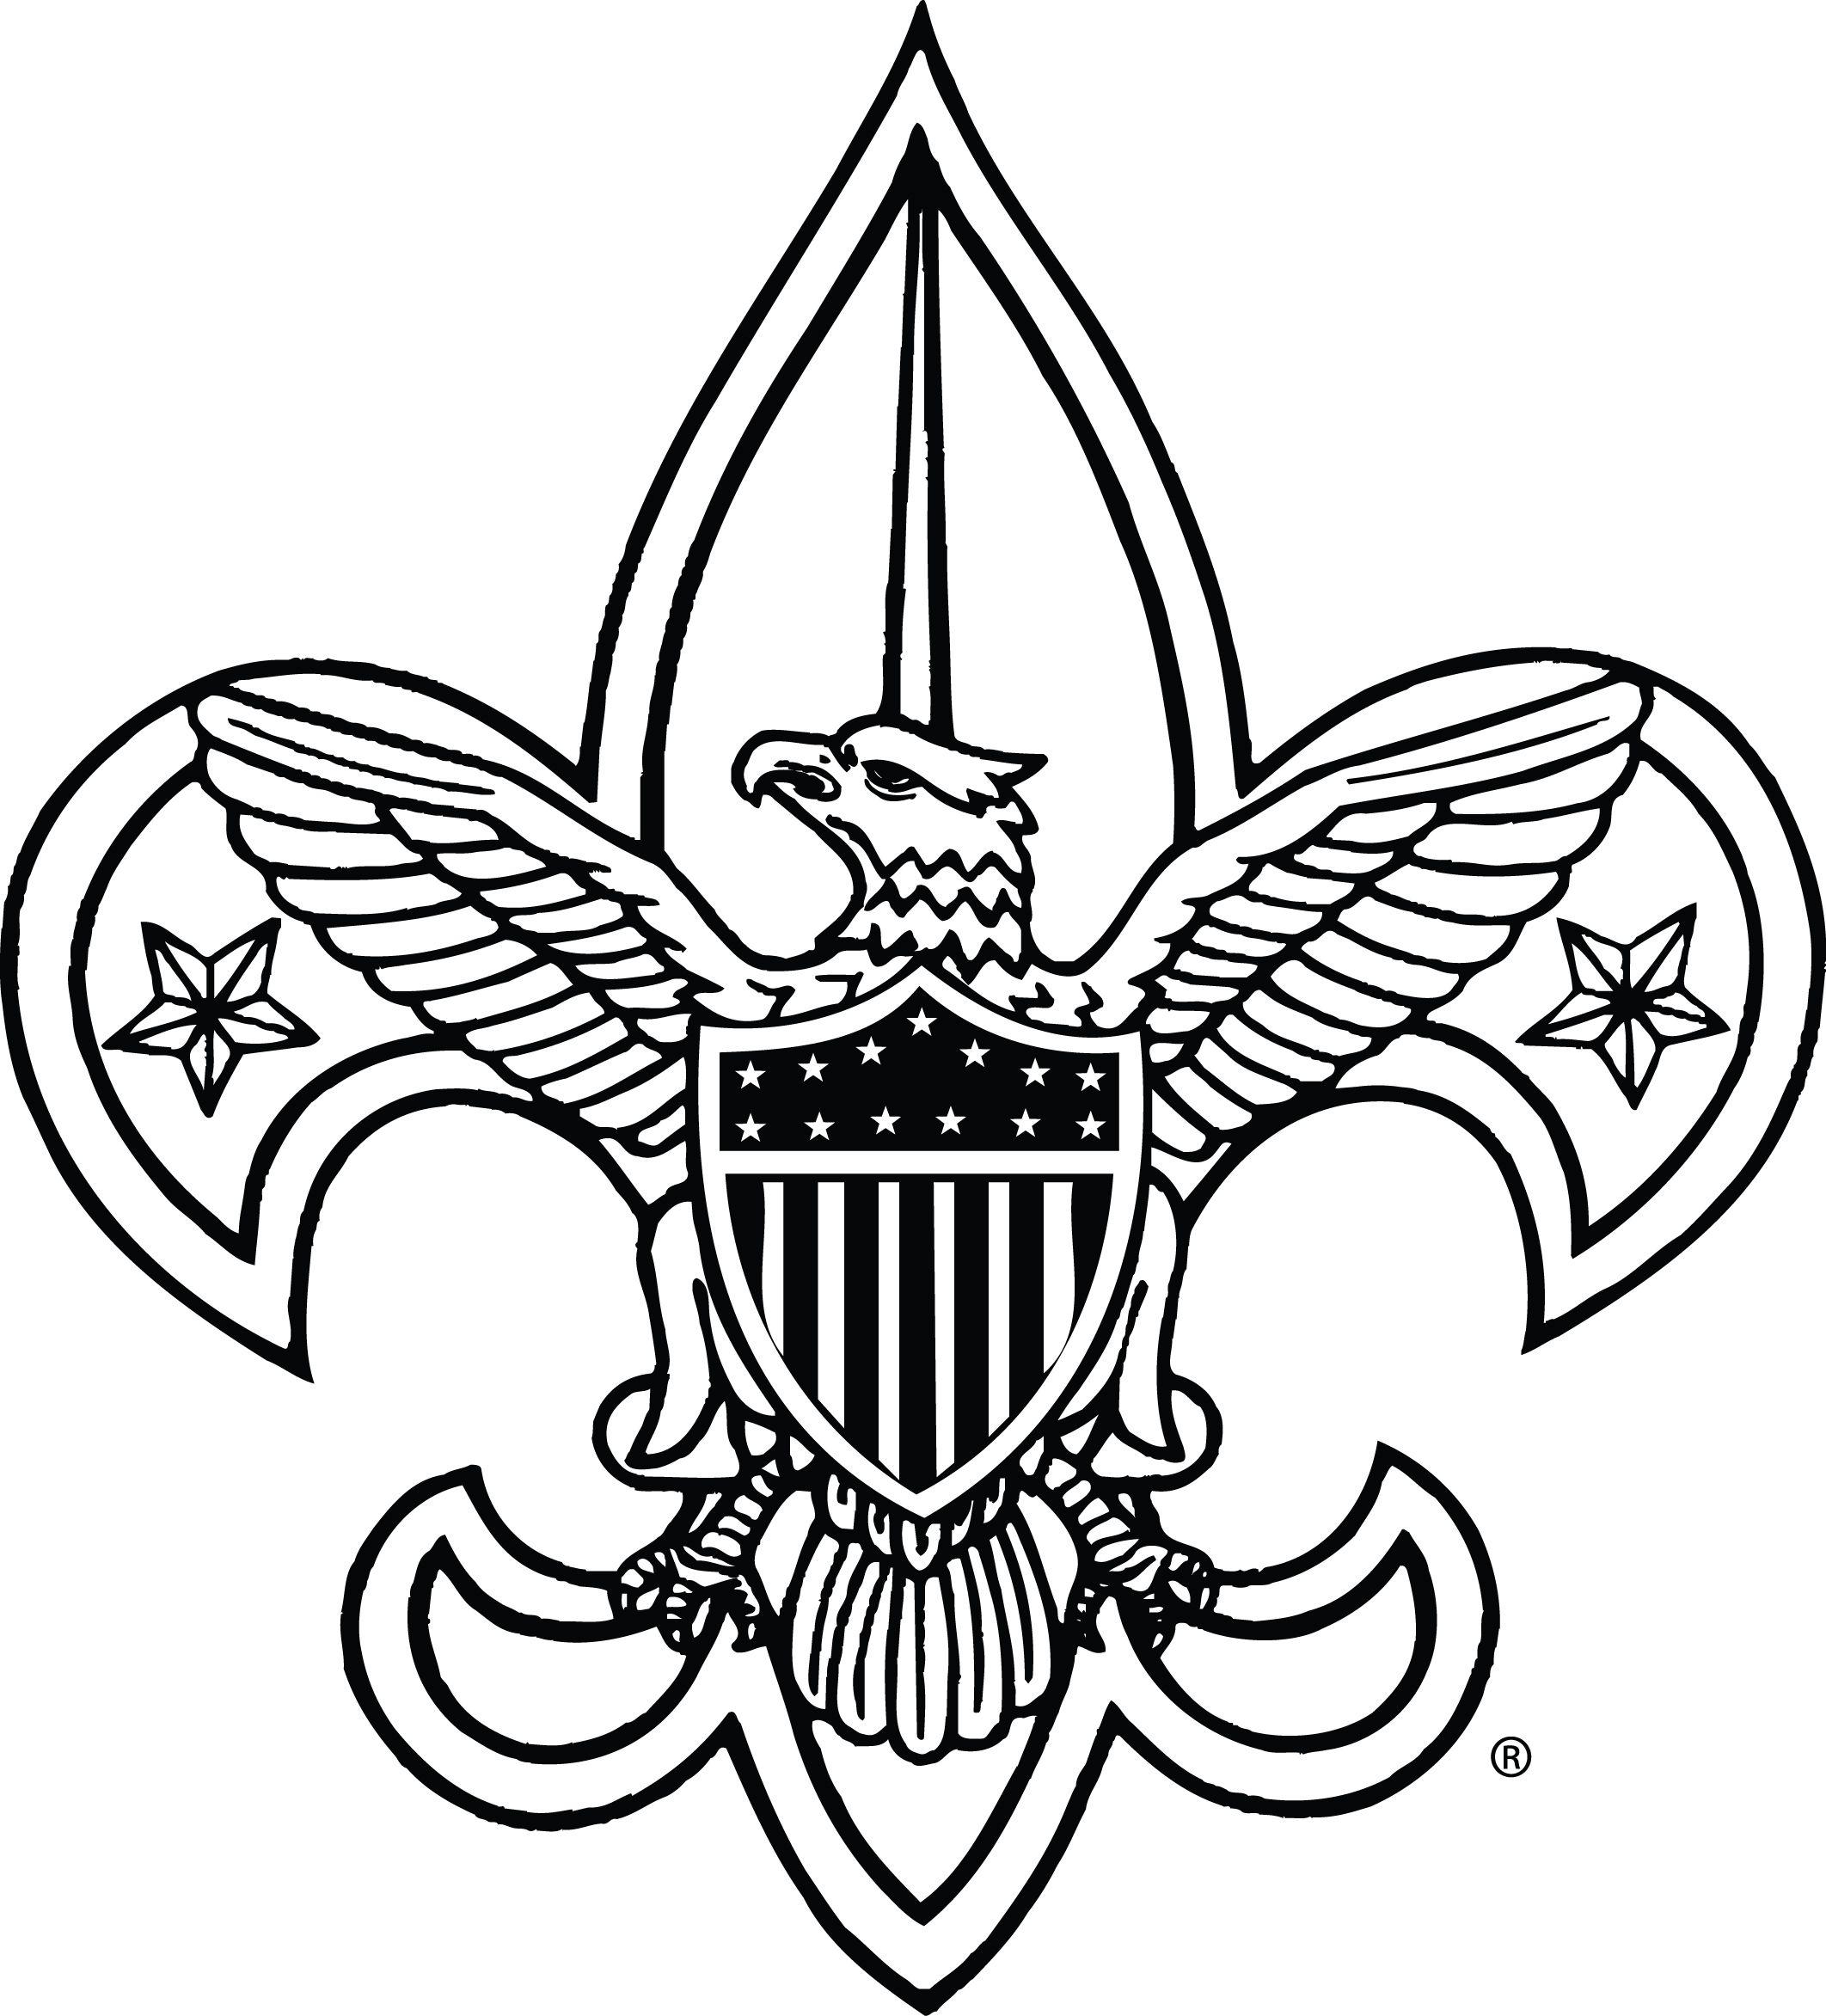 pin by daniel hosfield on tattoos pinterest logos and tattoo rh pinterest com boy scout emblem vector boy scout logo vector file